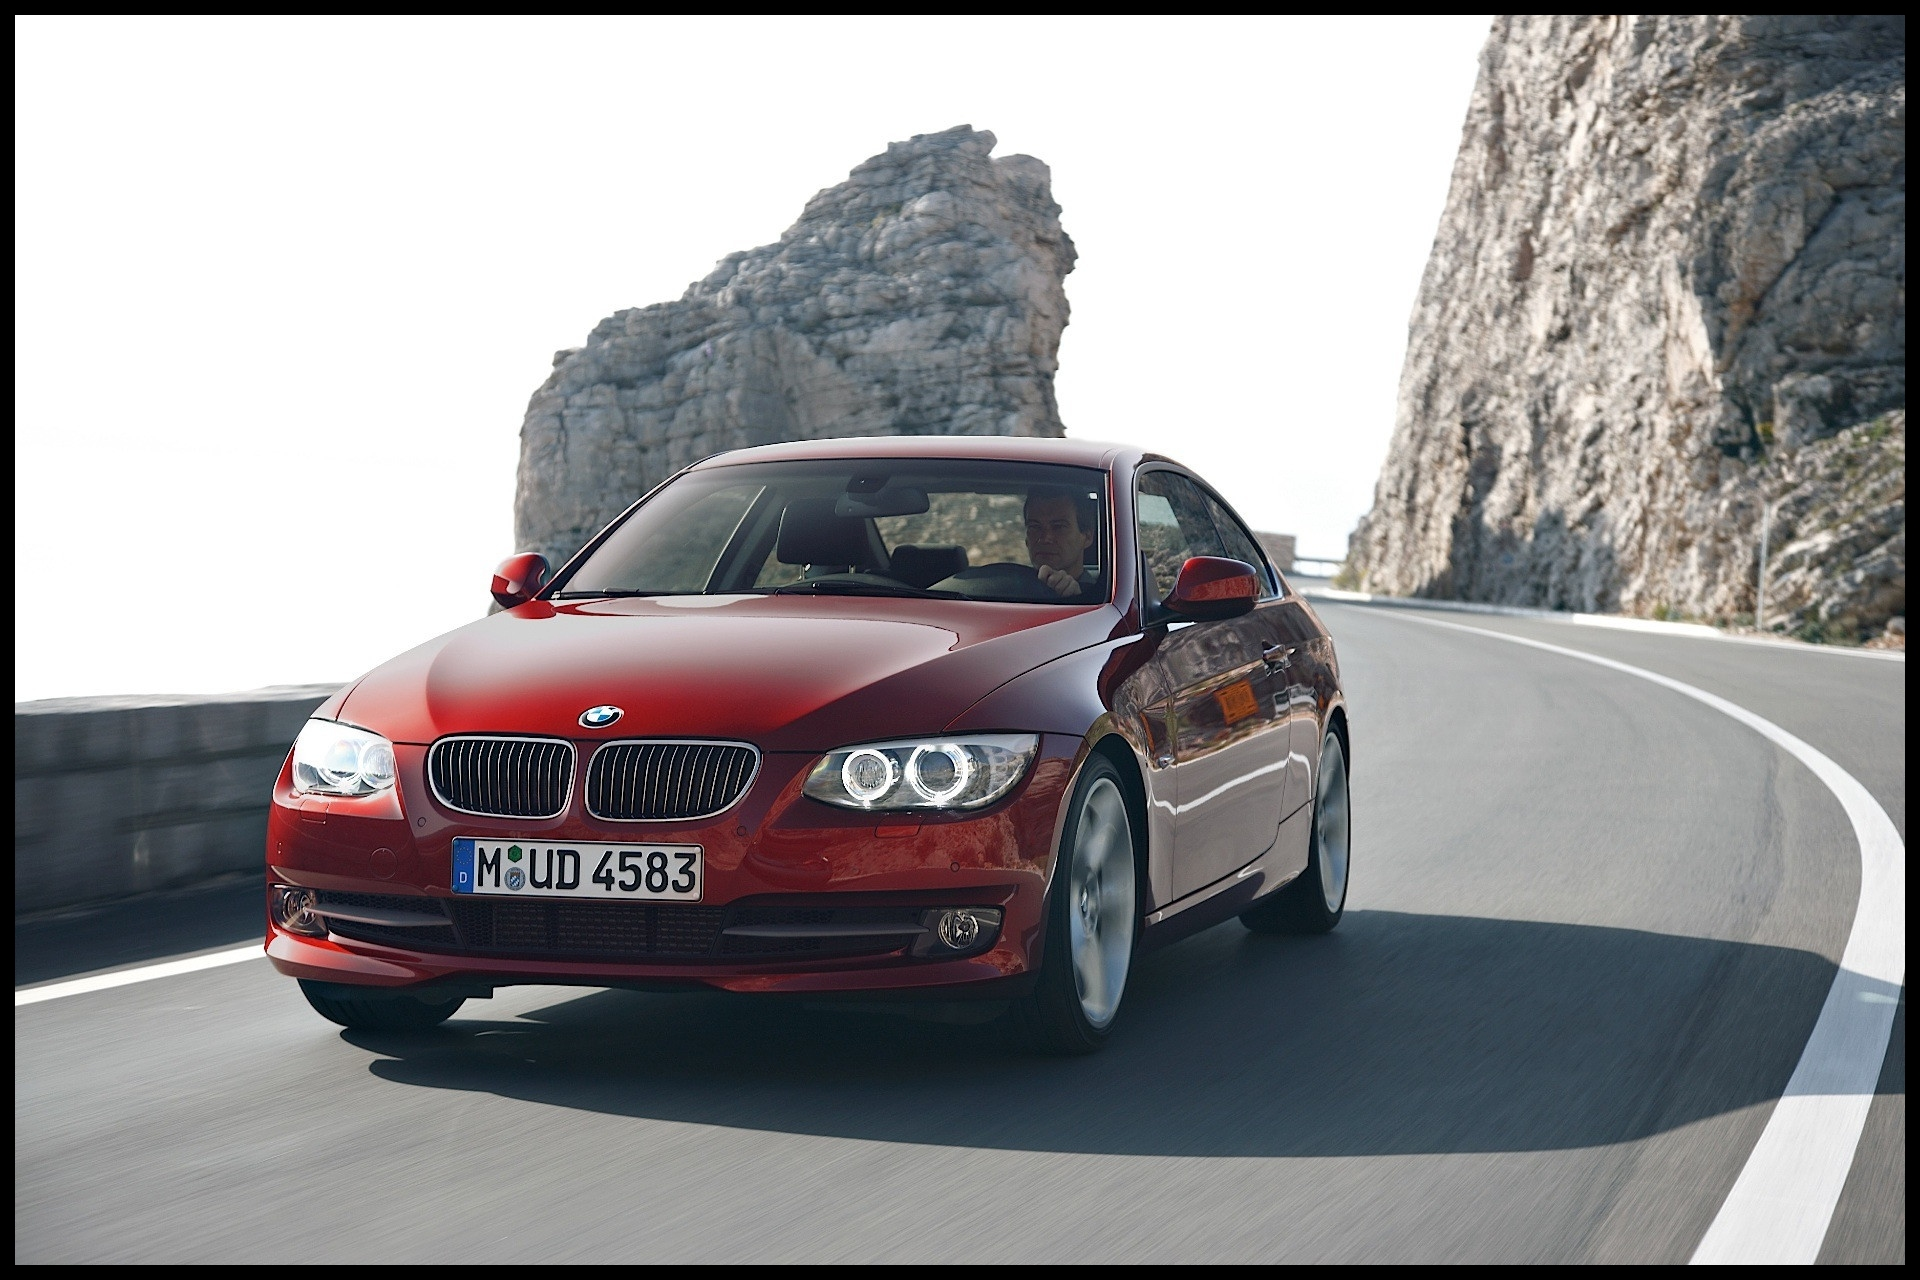 Bmw 335xi 2011 Luxury Bmw 3 Series Coupe E92 Specs 2010 2011 2012 2013 Autoevolution